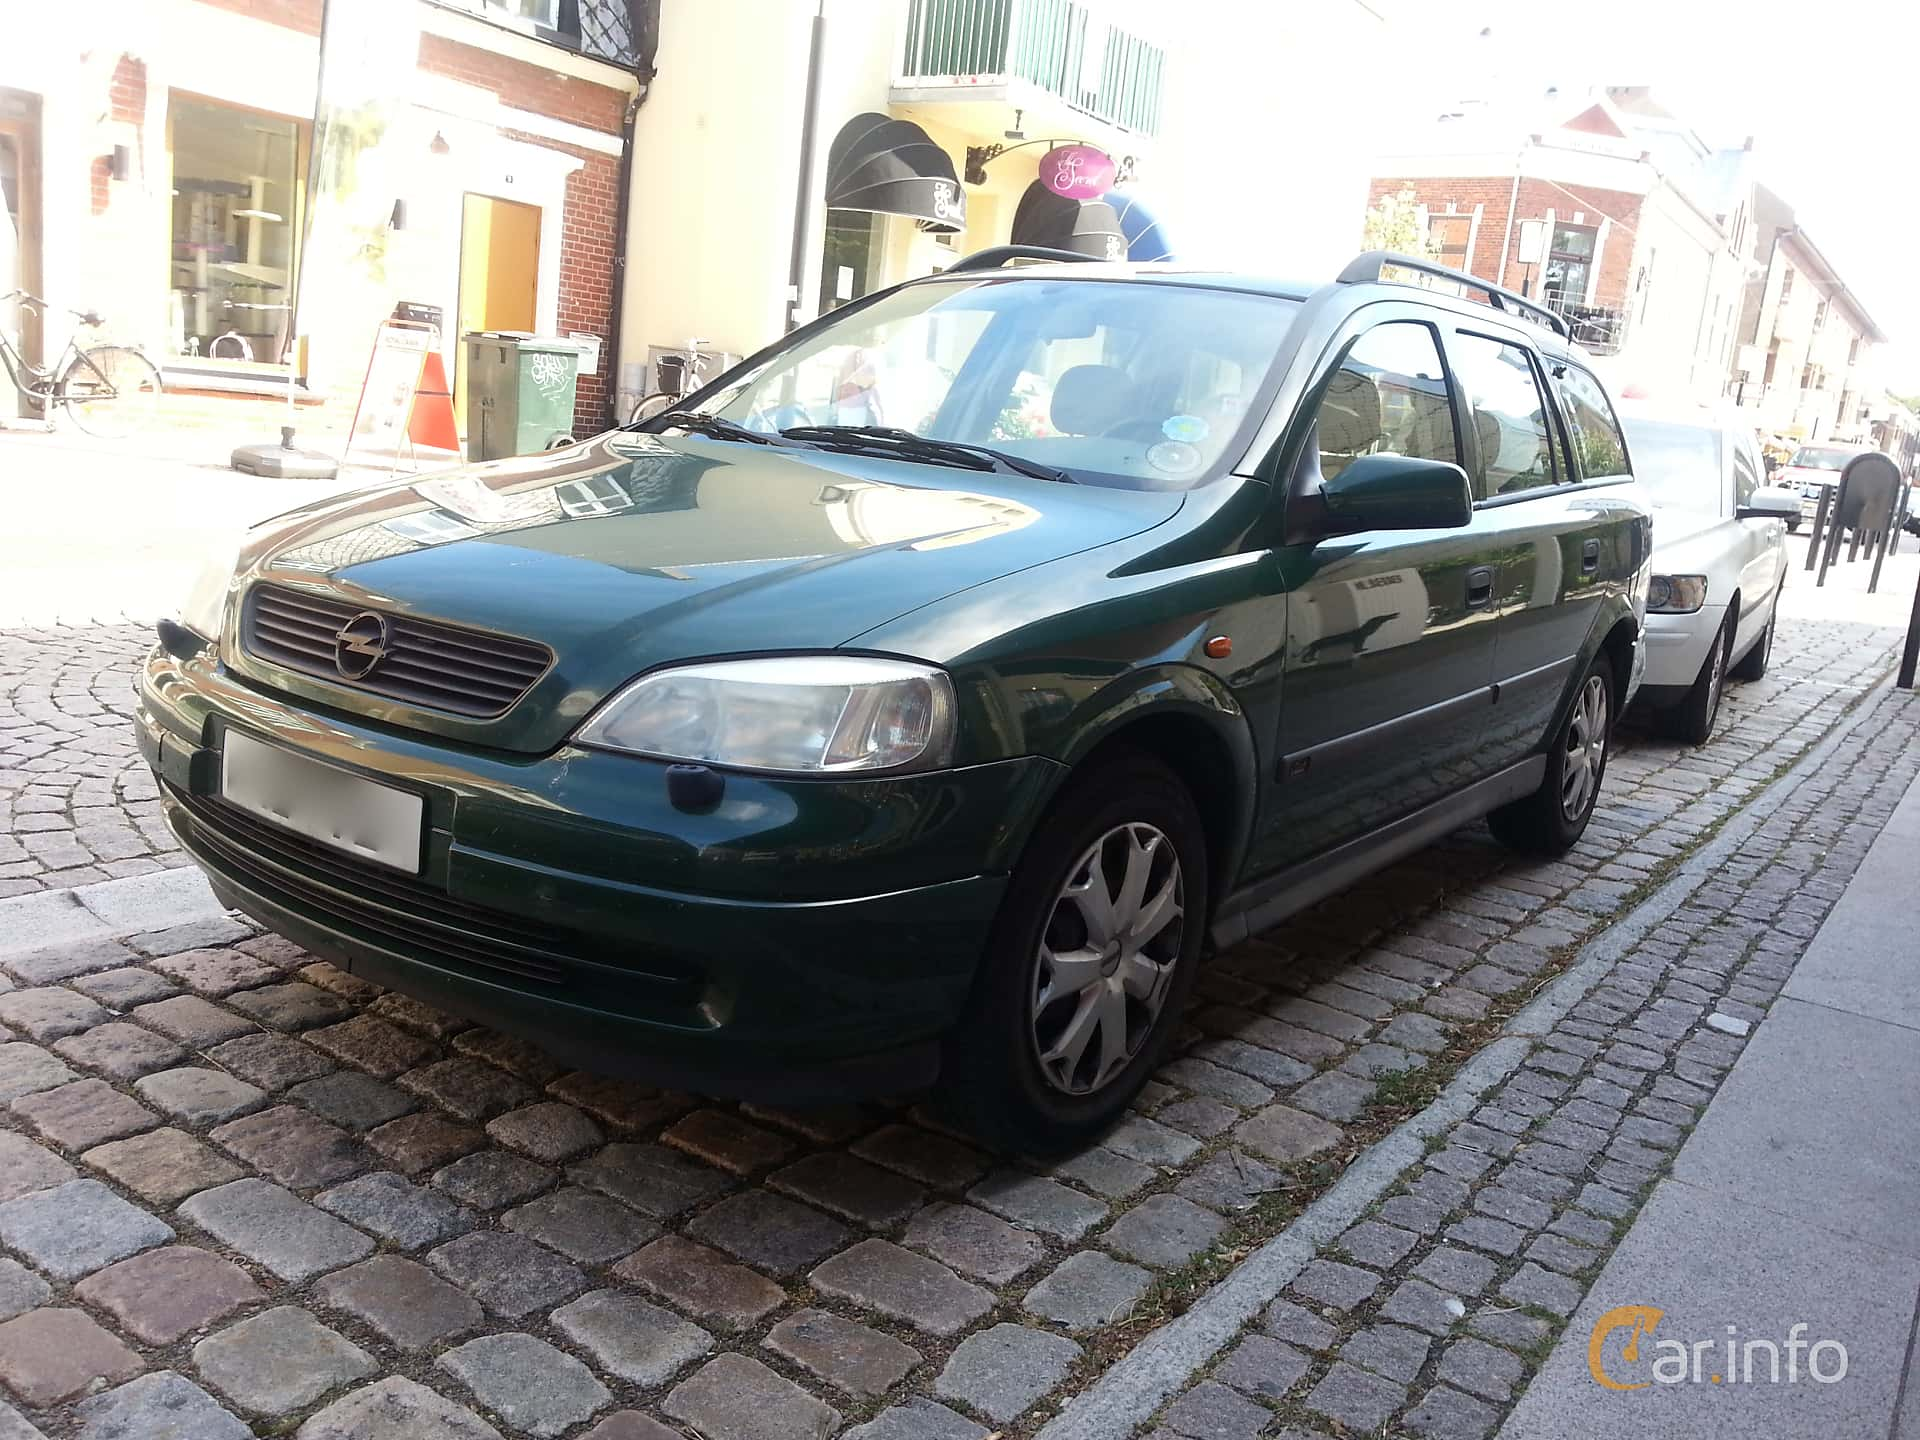 Front/Side of Opel Astra Caravan 1.6 Manual, 101ps, 1998